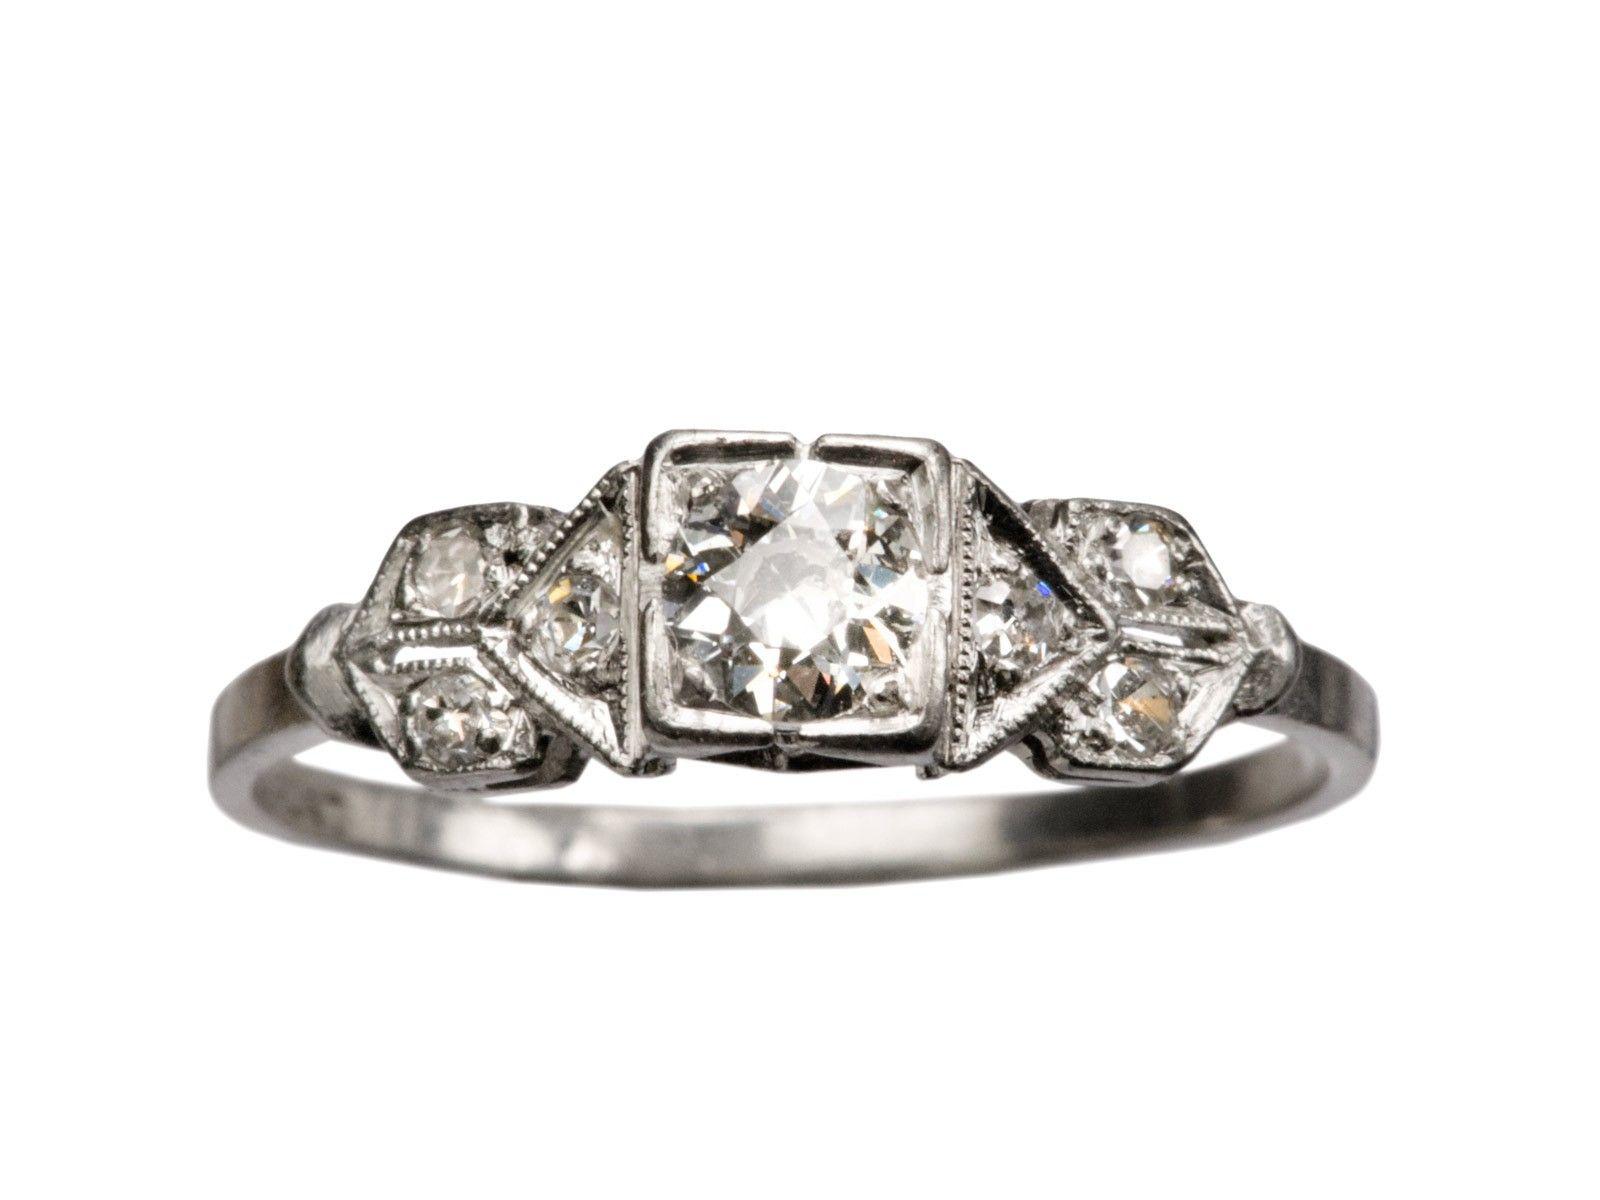 1930s 0.25ct Deco Ring